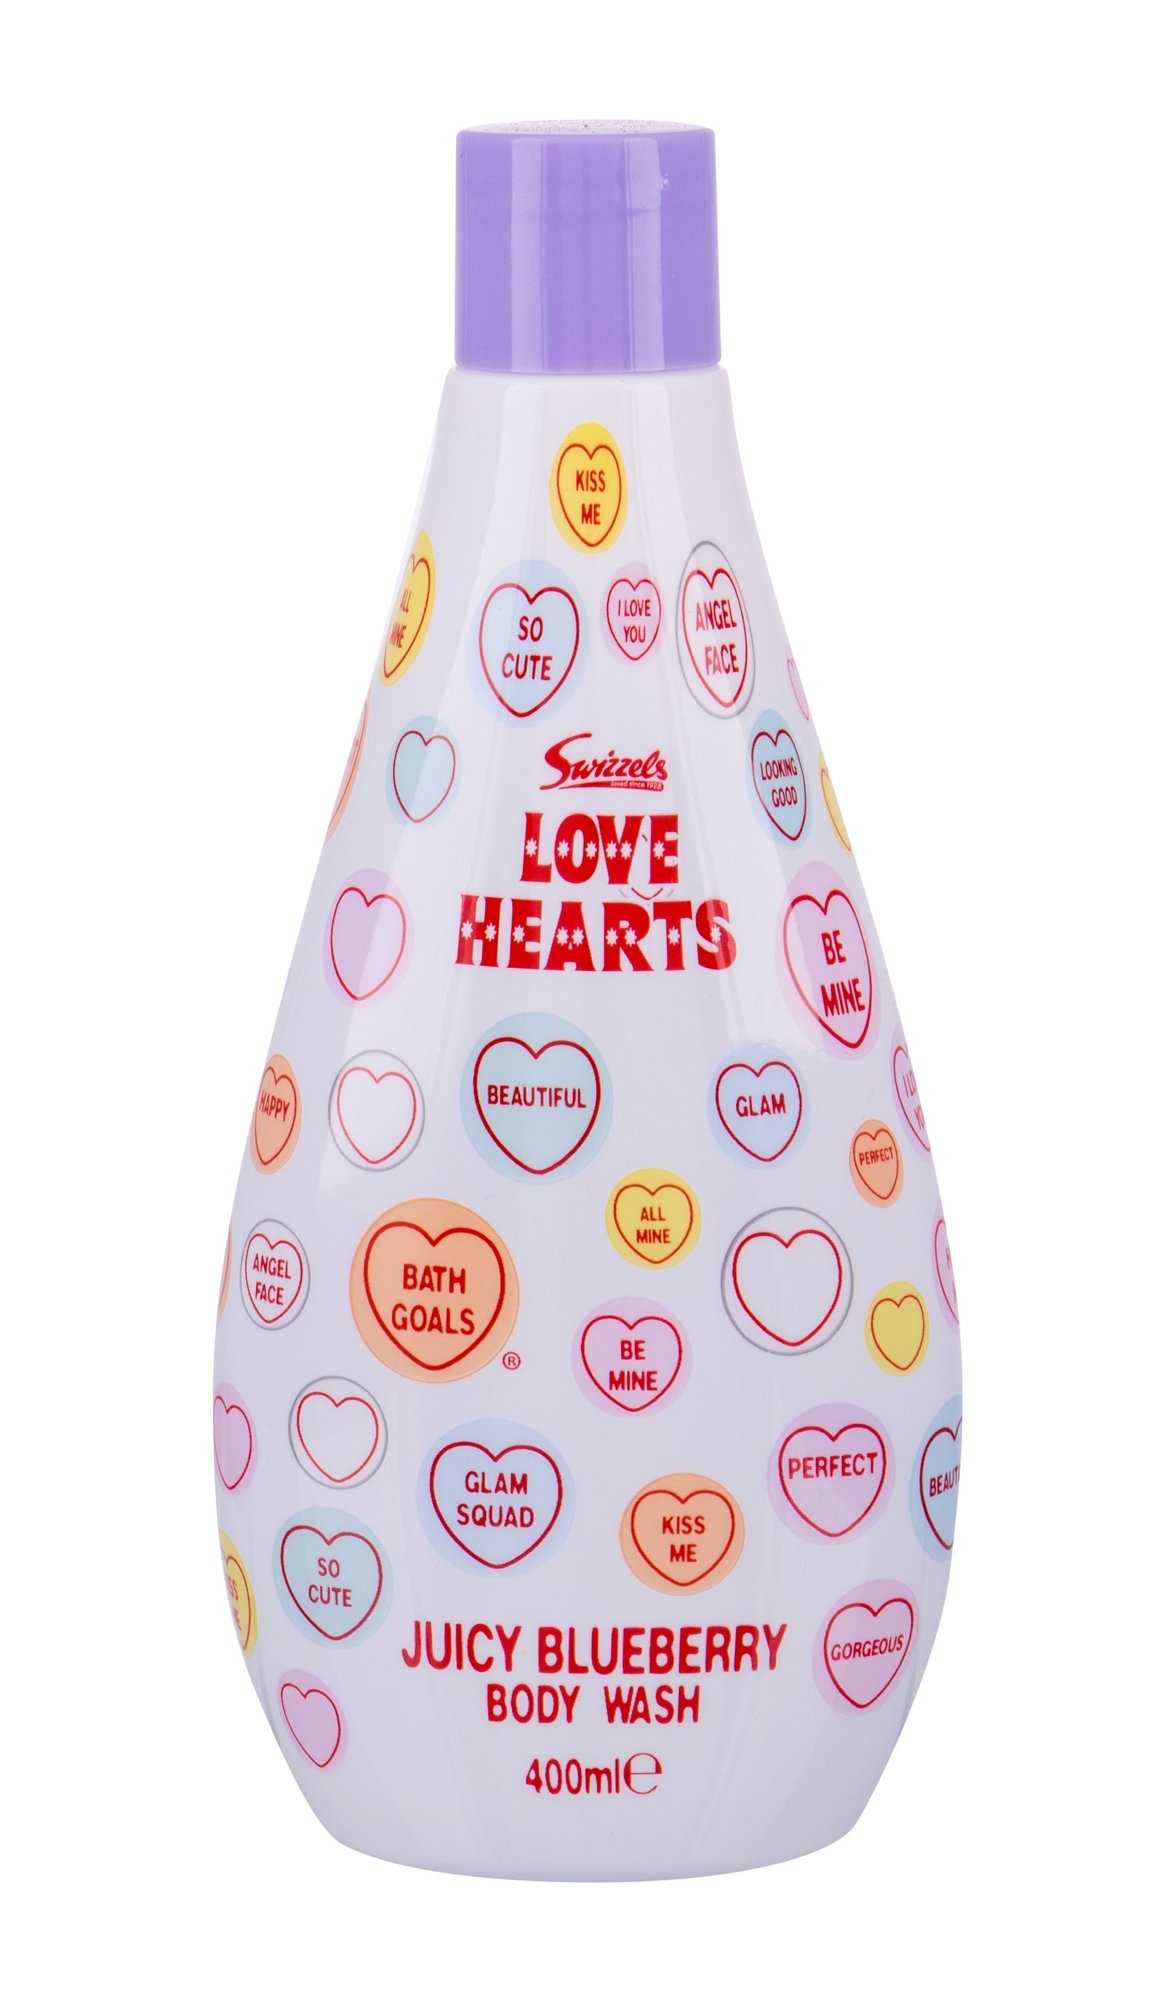 Higienos priemonė Swizzels Love Hearts